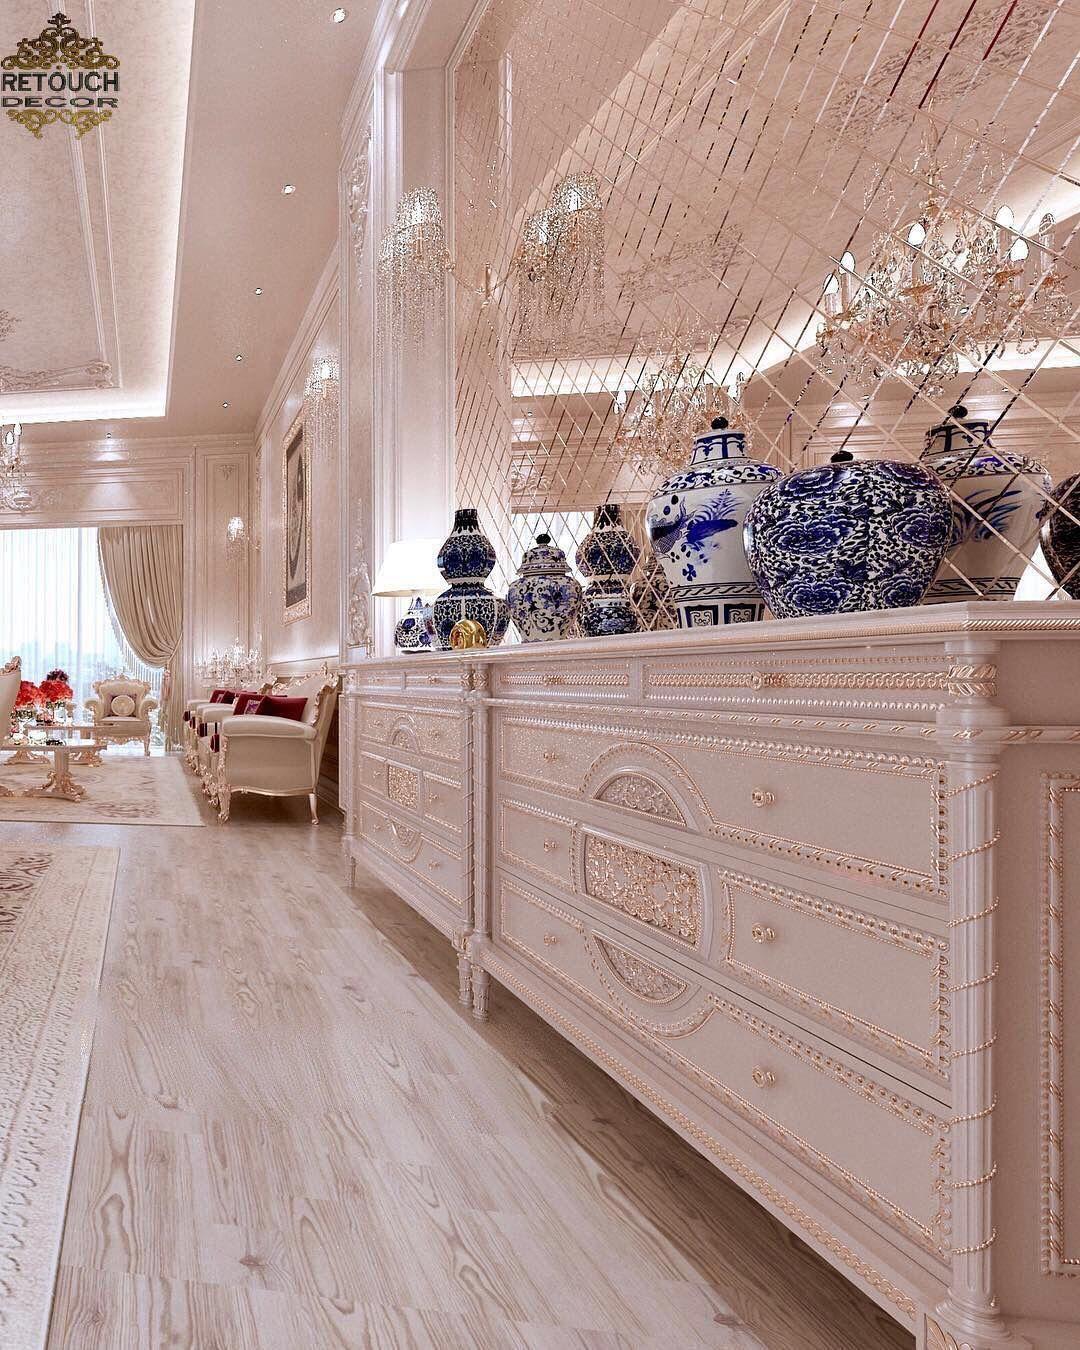 New The 10 Best Home Decor With Pictures اسقف جبس جداريات اصباغ تعتيق بانوهات تنجيد جلسات ستائر مف Luxury Design Decor Interior Design Home Decor